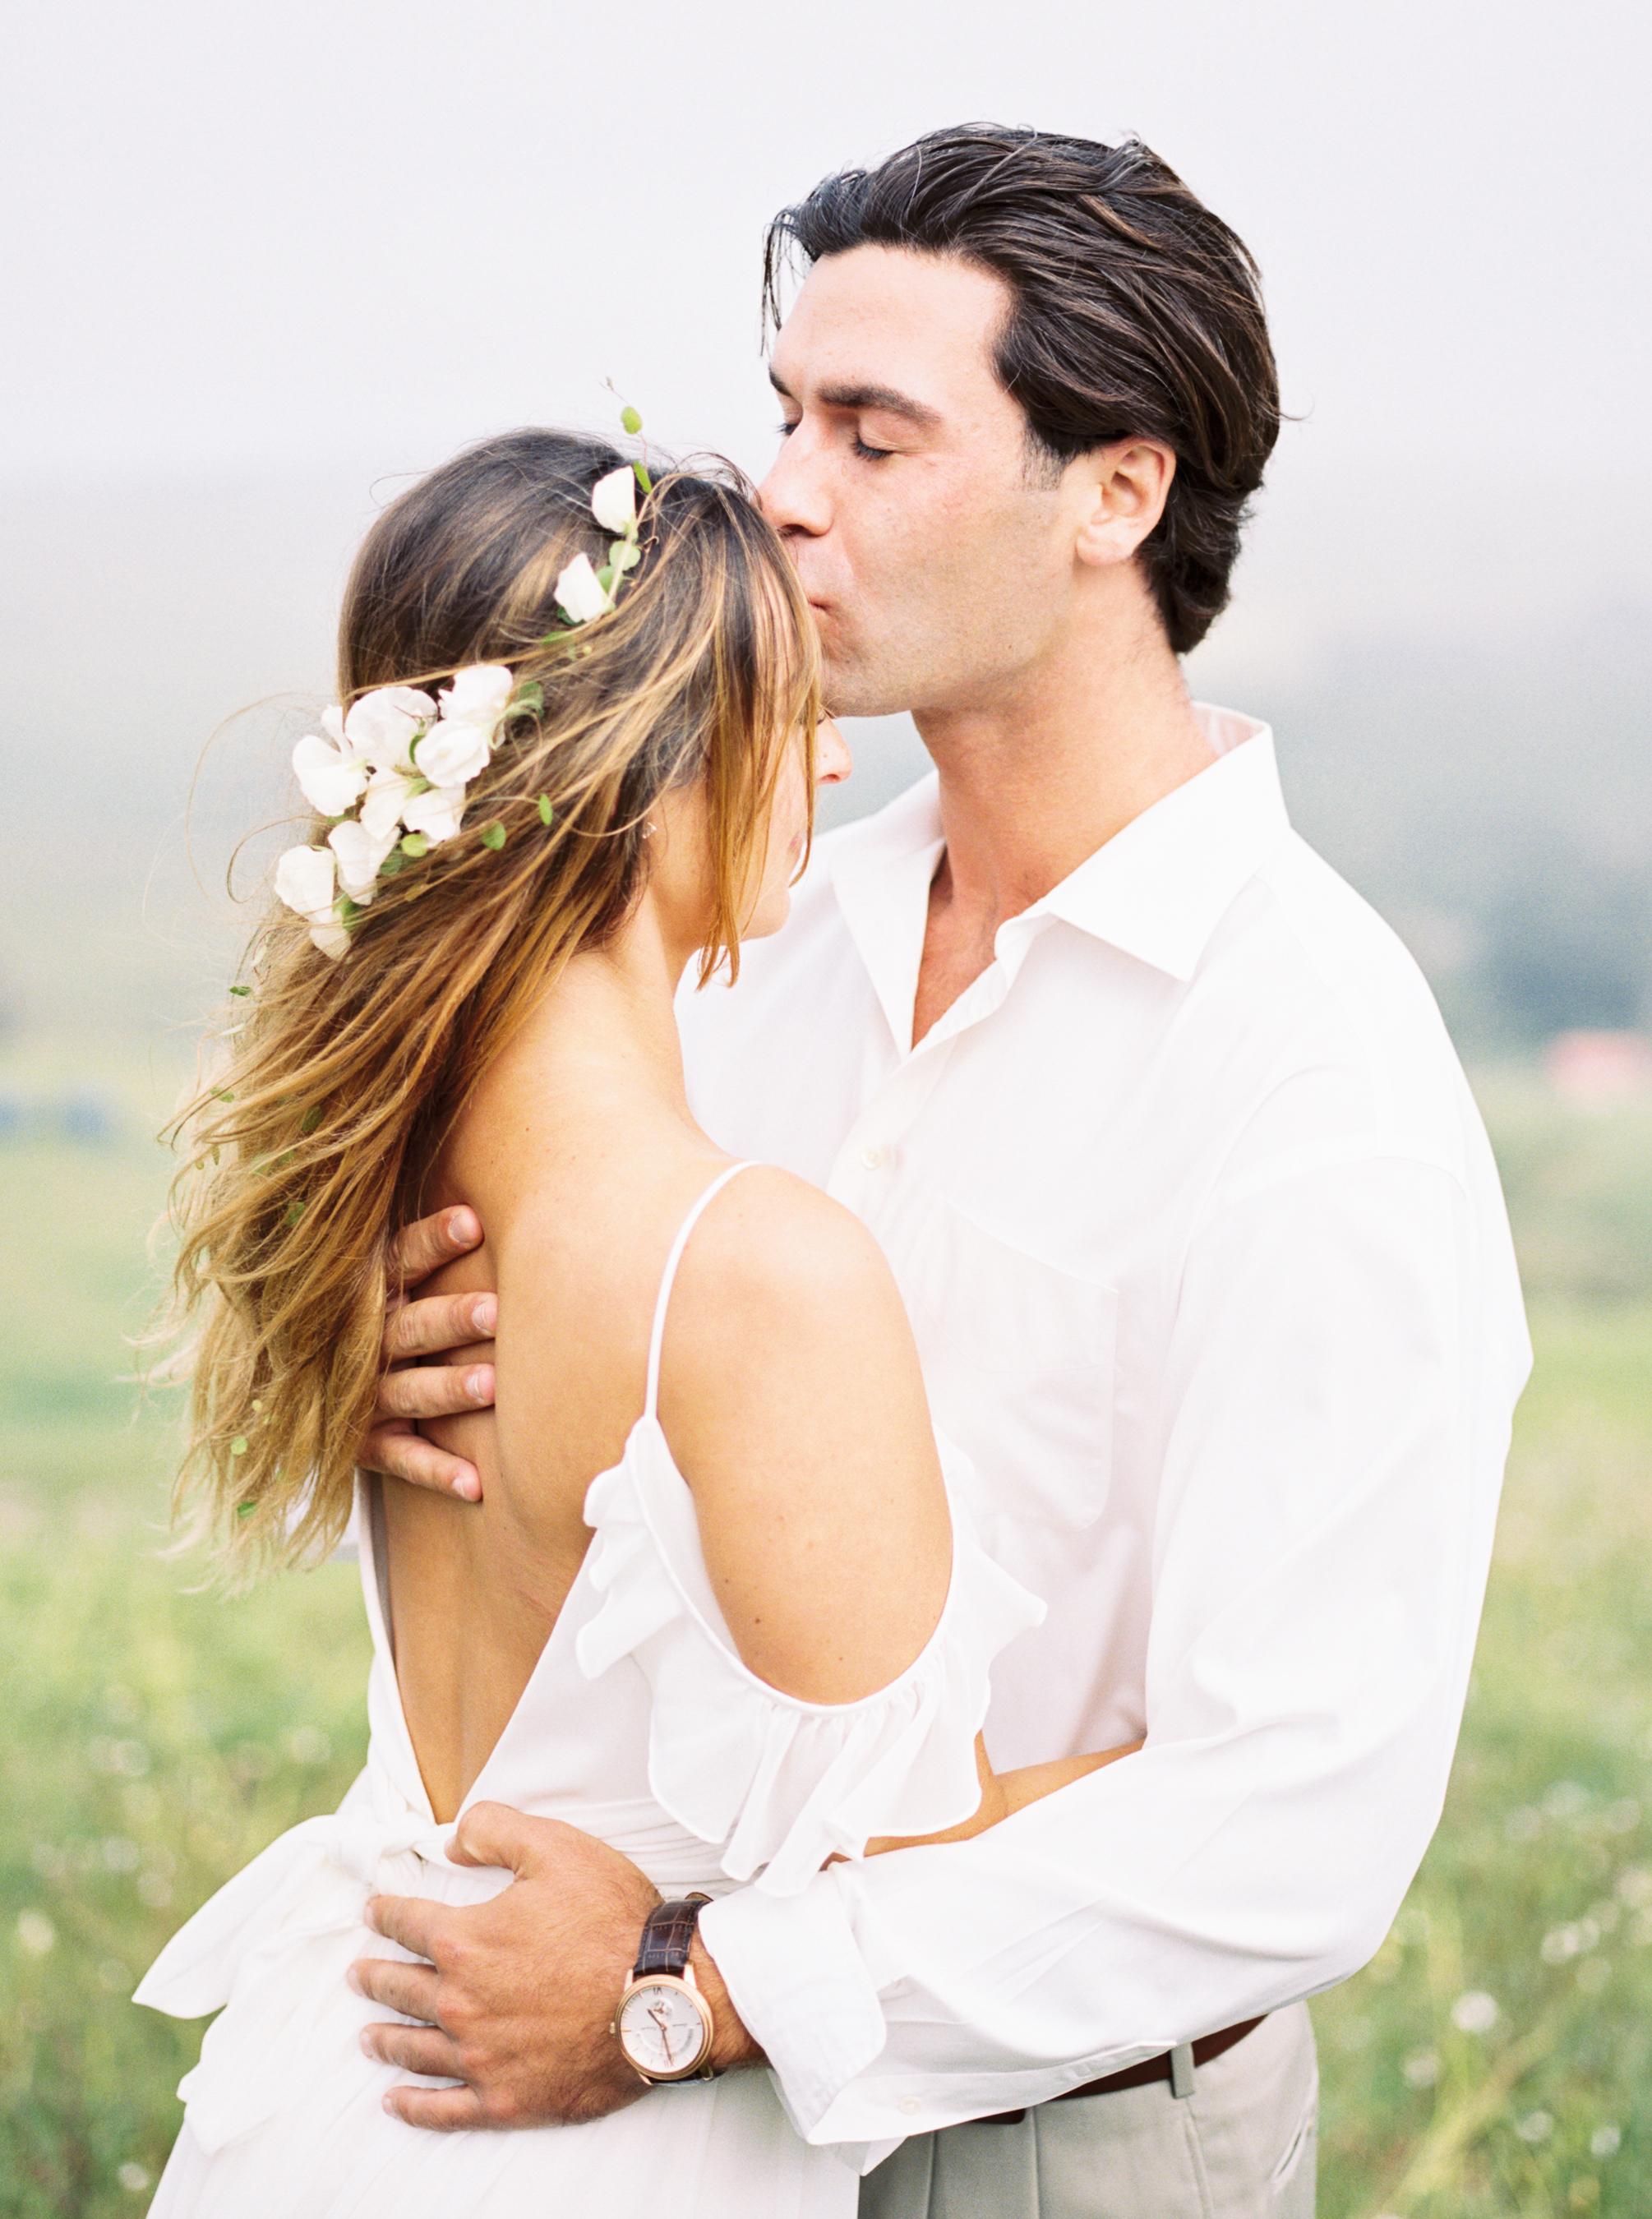 Danford-Photography-Bozeman-Montana-California-Wedding-Engagement-Photographer-28.jpg